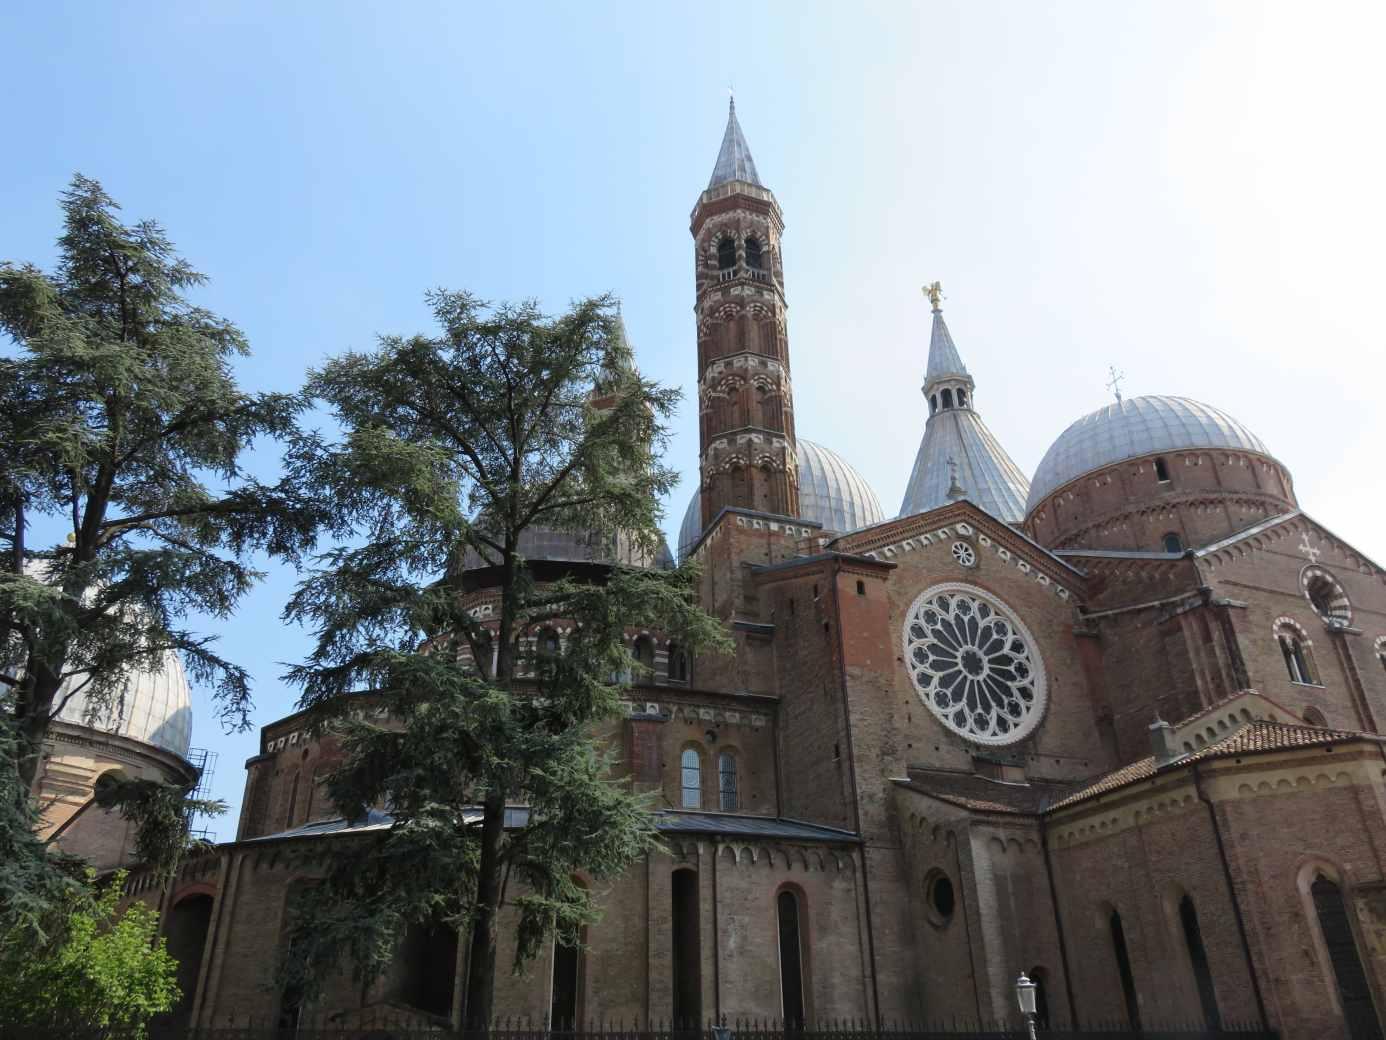 The Basilica of Saint Anthony, Padua, Italy